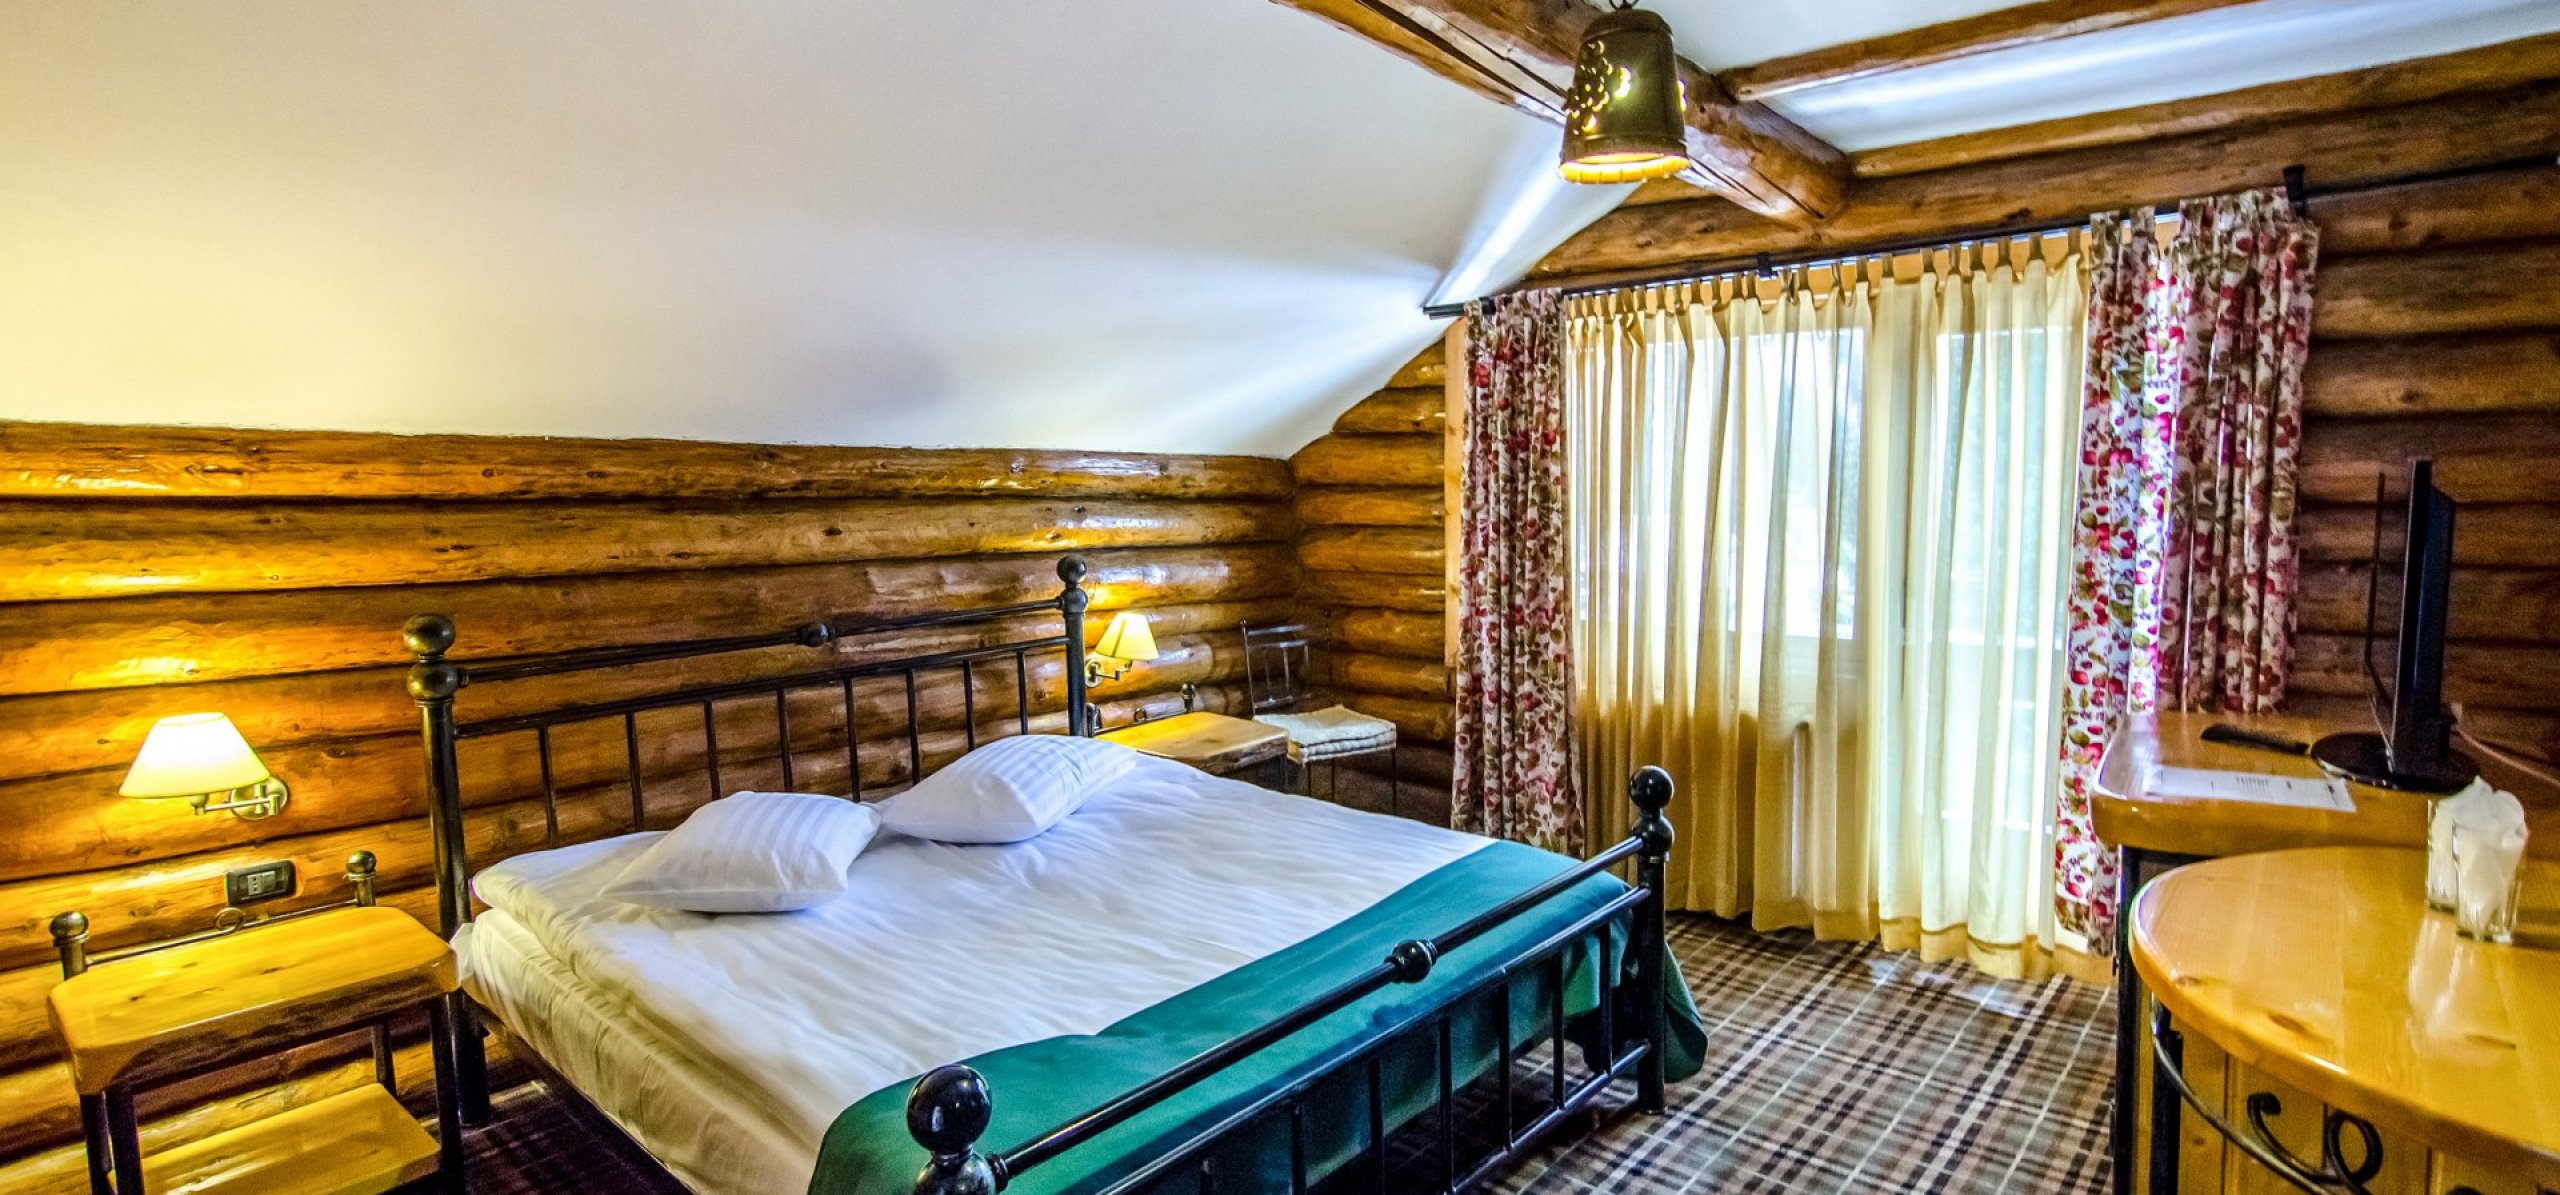 camera-matrimoniala-luminoasa-vila-de-lemn-cazare-in-moeciu